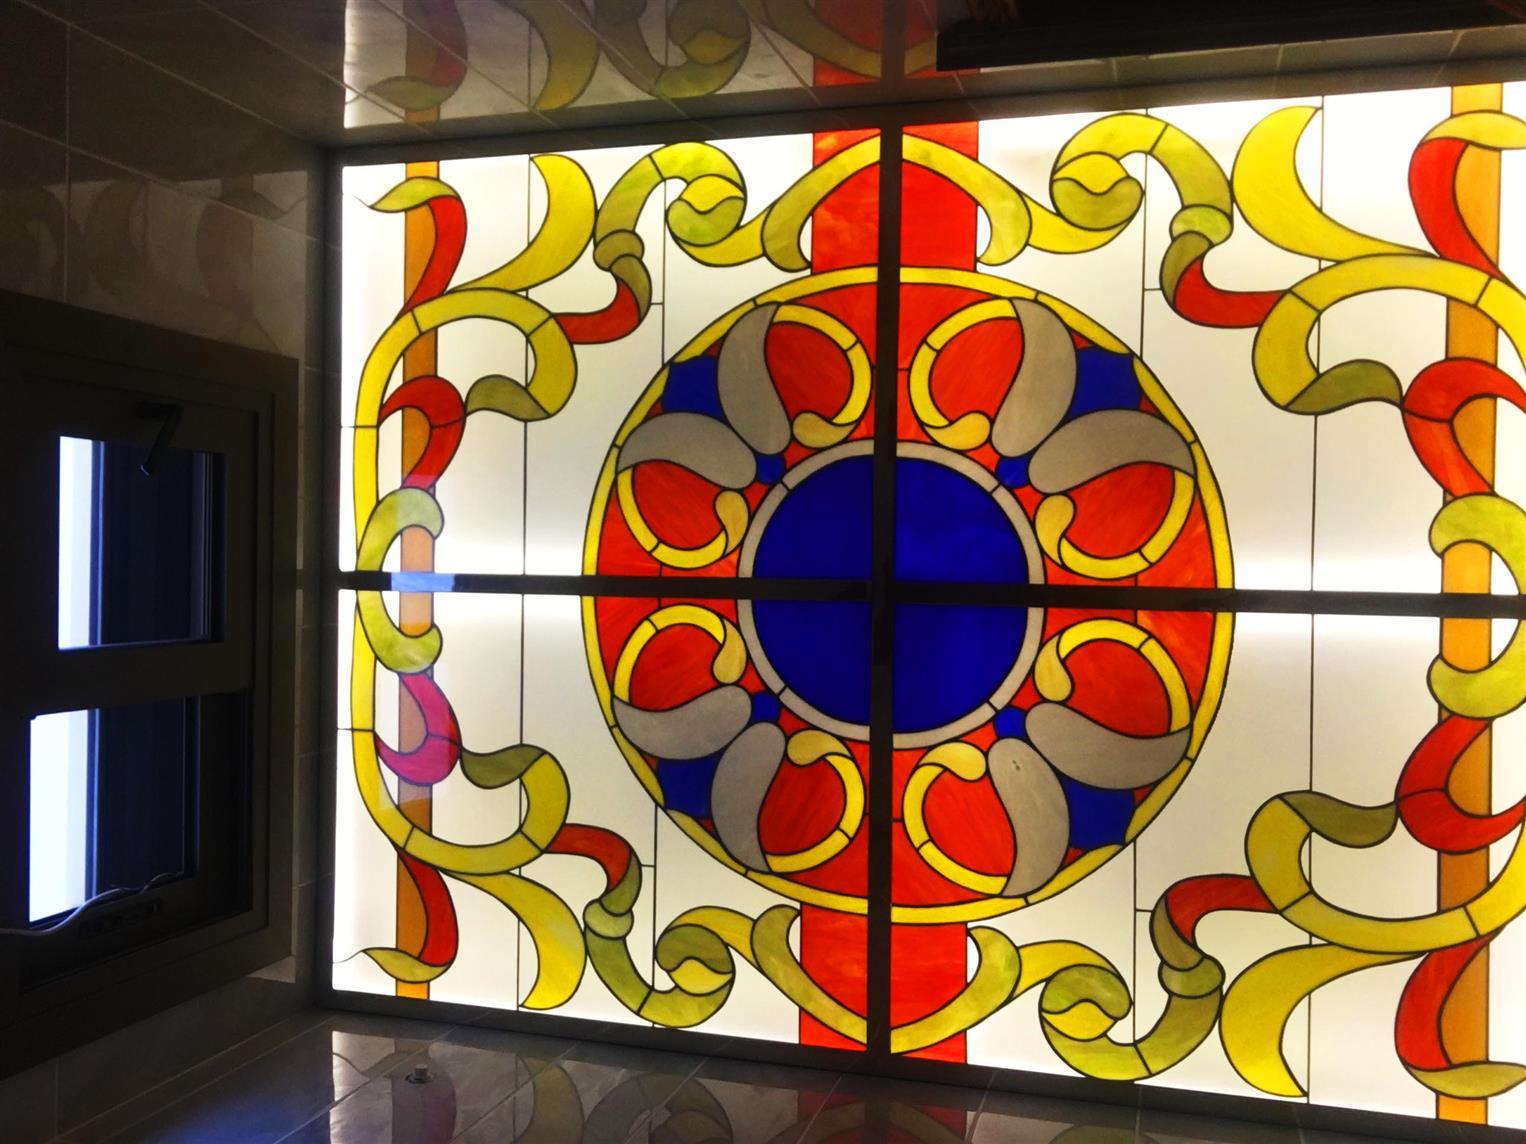 hamam-banyo-tavan-vitraylari2017122118527151.jpg izmir vitray çalışması